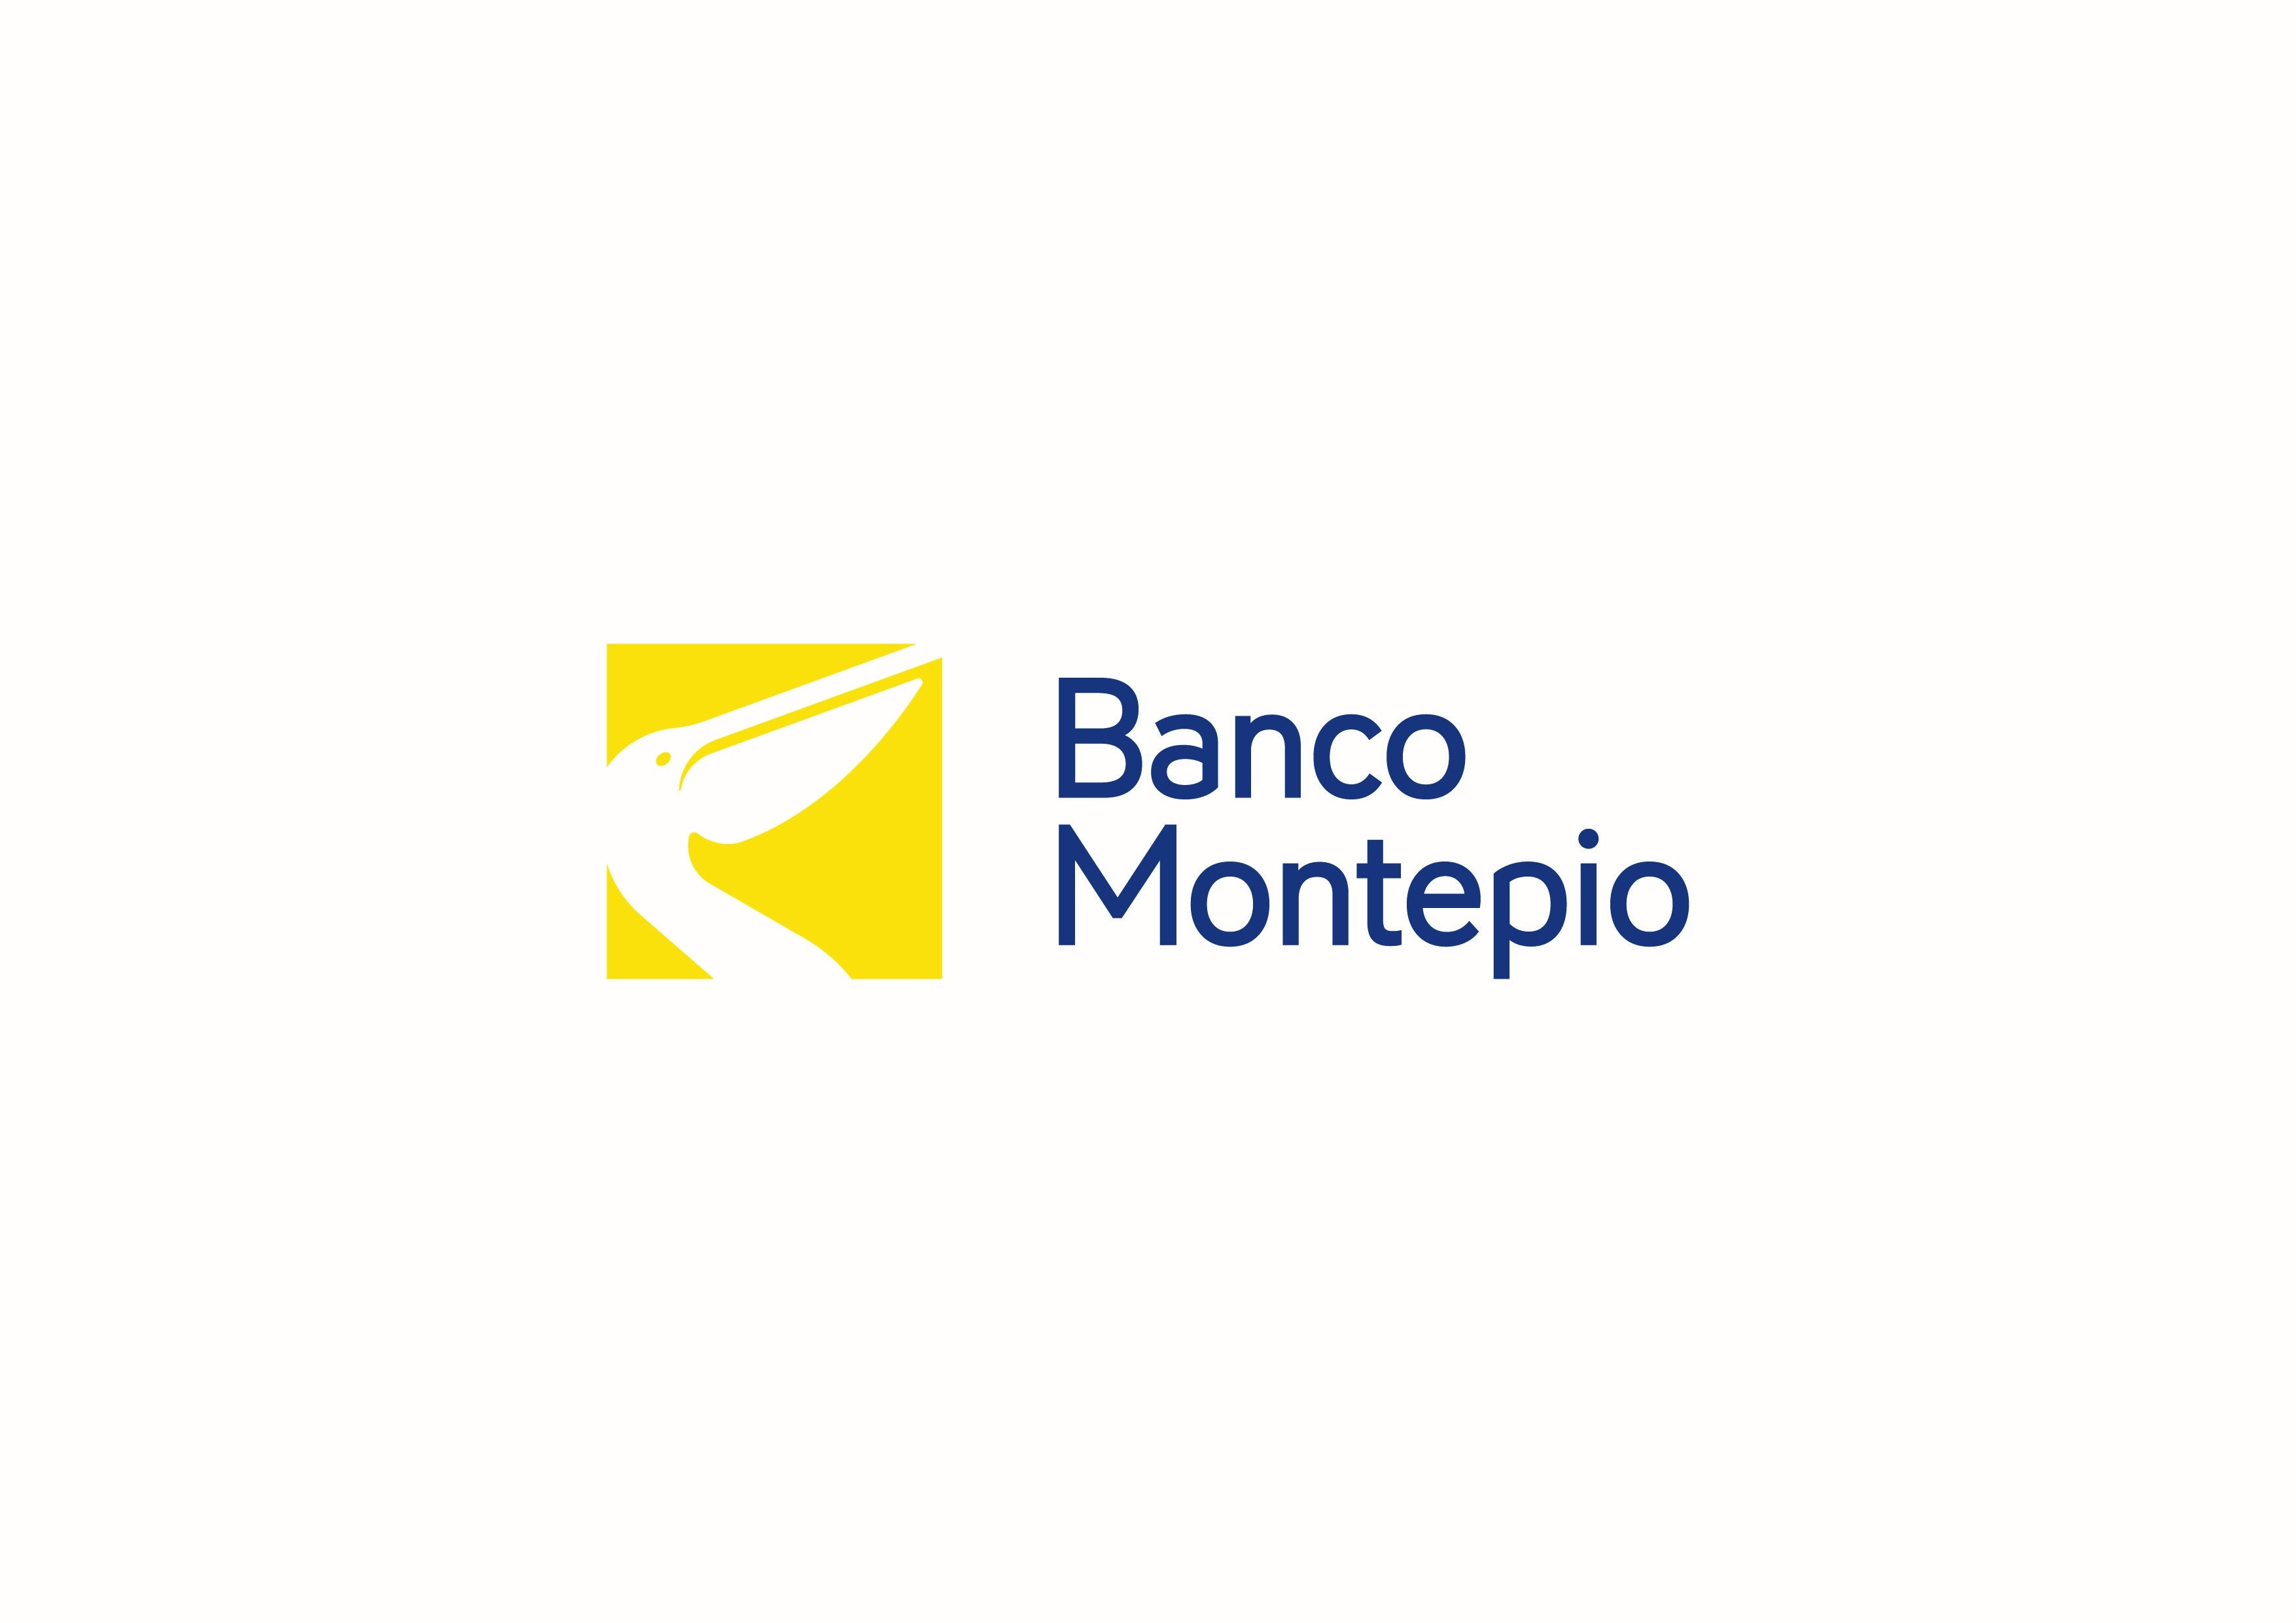 Banco Montepio  logo